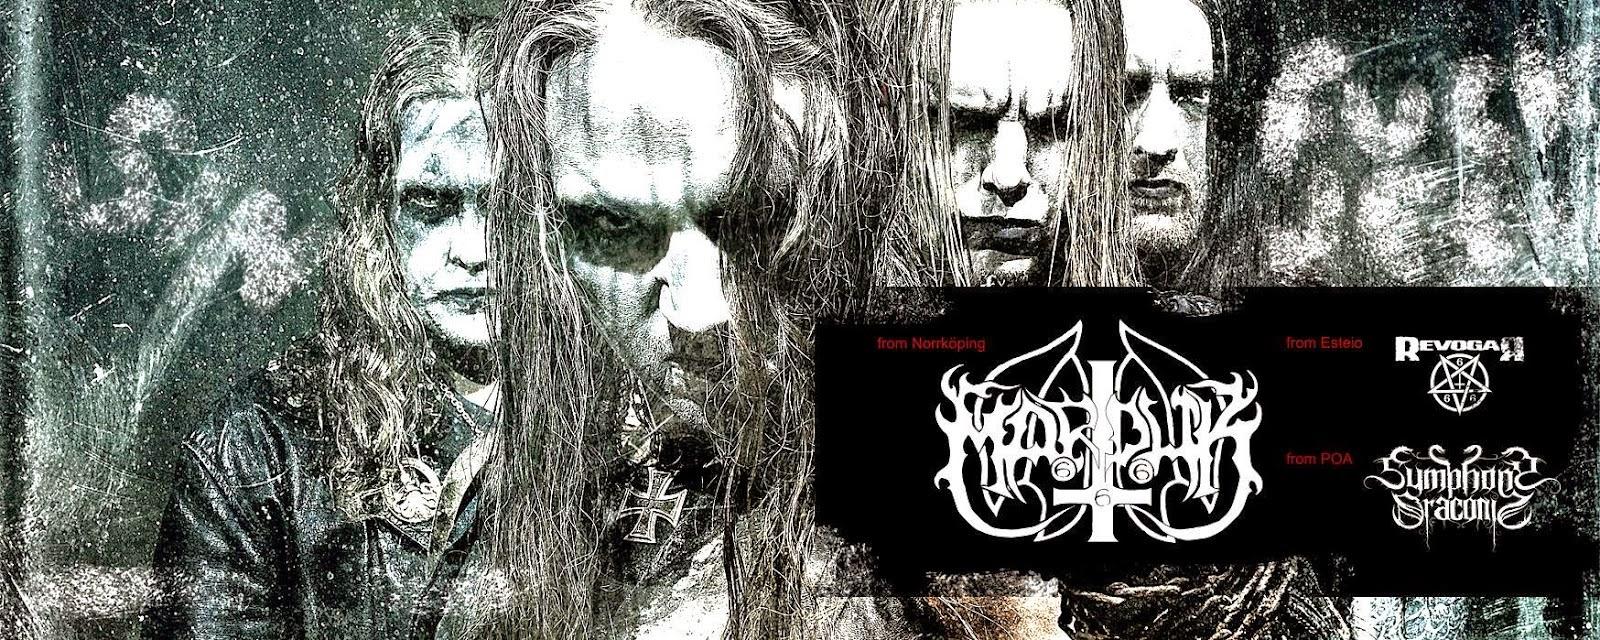 De volta ao RS, os mestres do Black Metal!